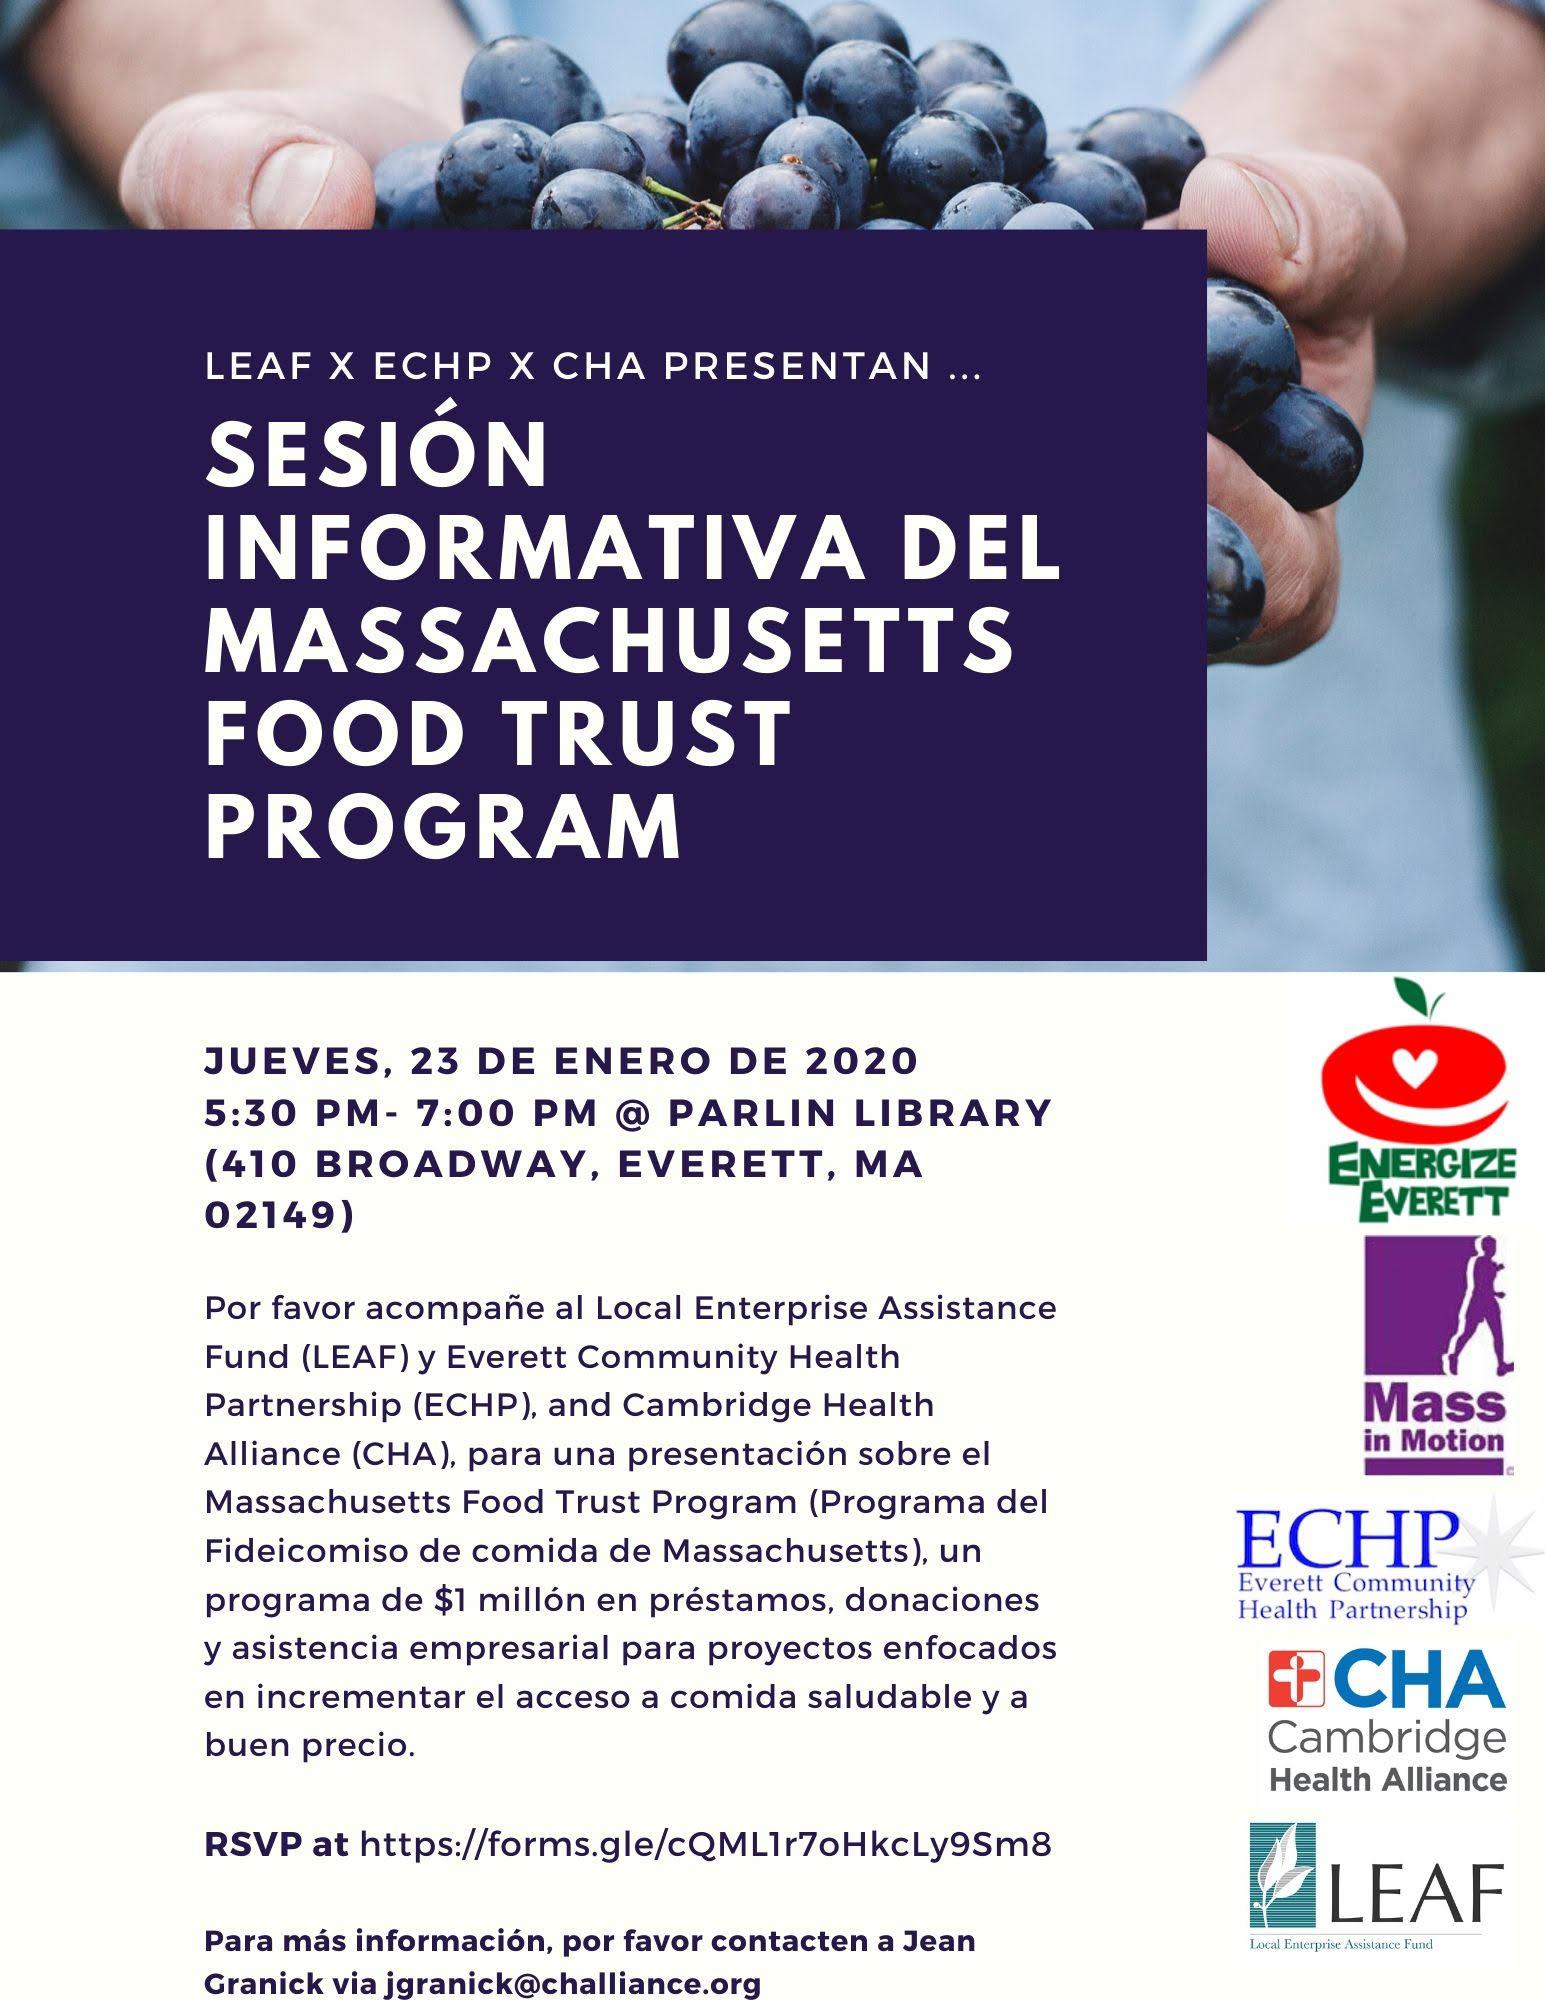 MAfoodtrustSpanish.jpg